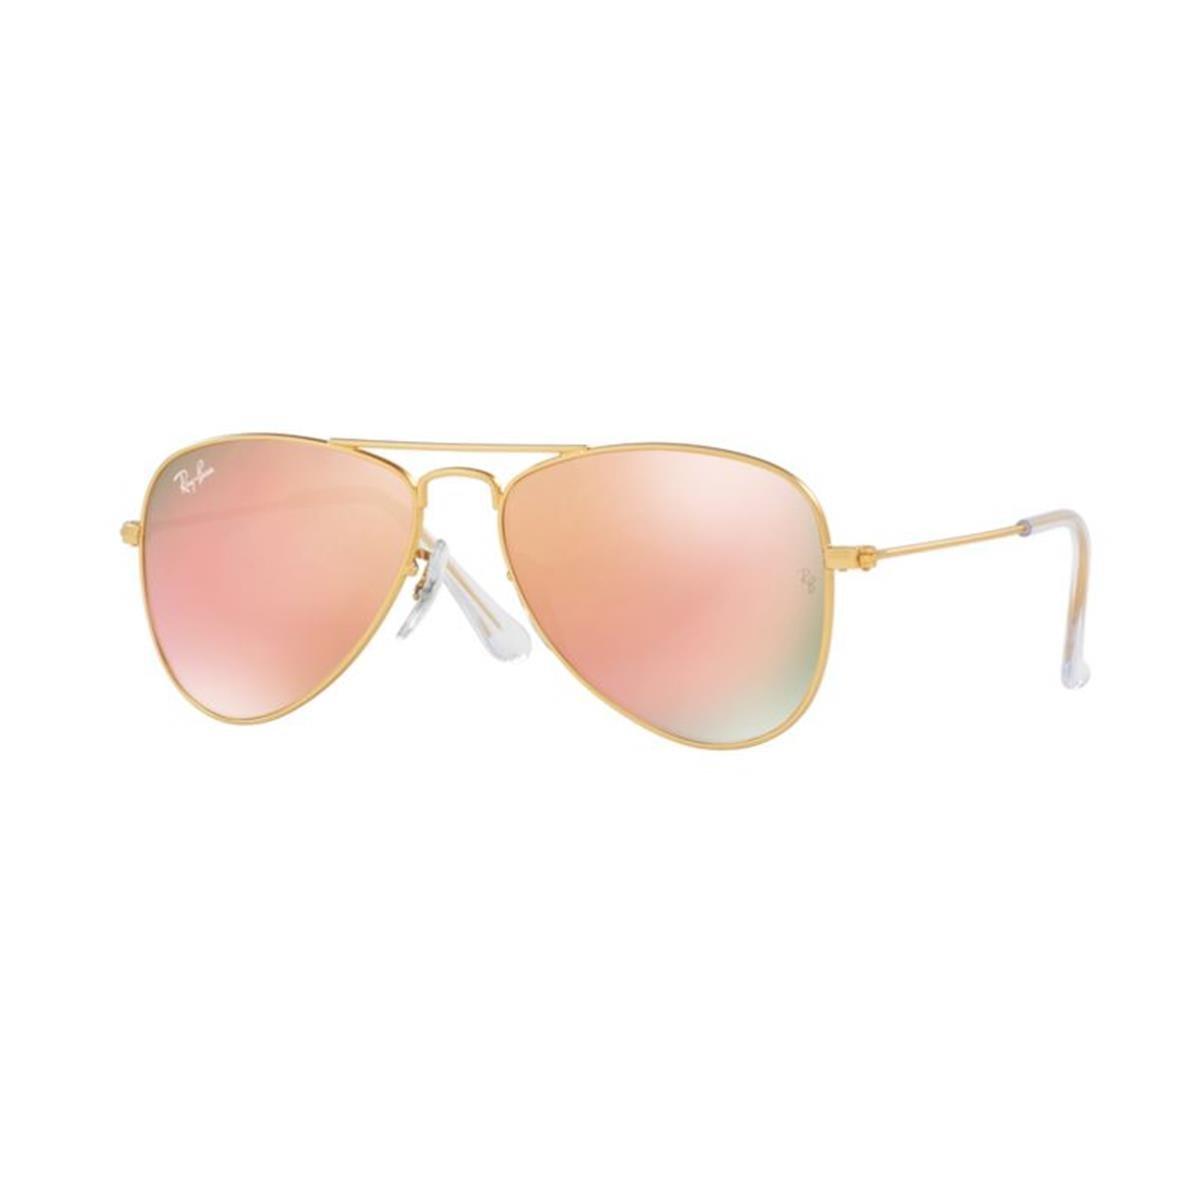 Ray-Ban Jr. Kids Aviator Kids Sunglasses (RJ9506) Gold Matte/Bronze Metal - Non-Polarized - 50mm